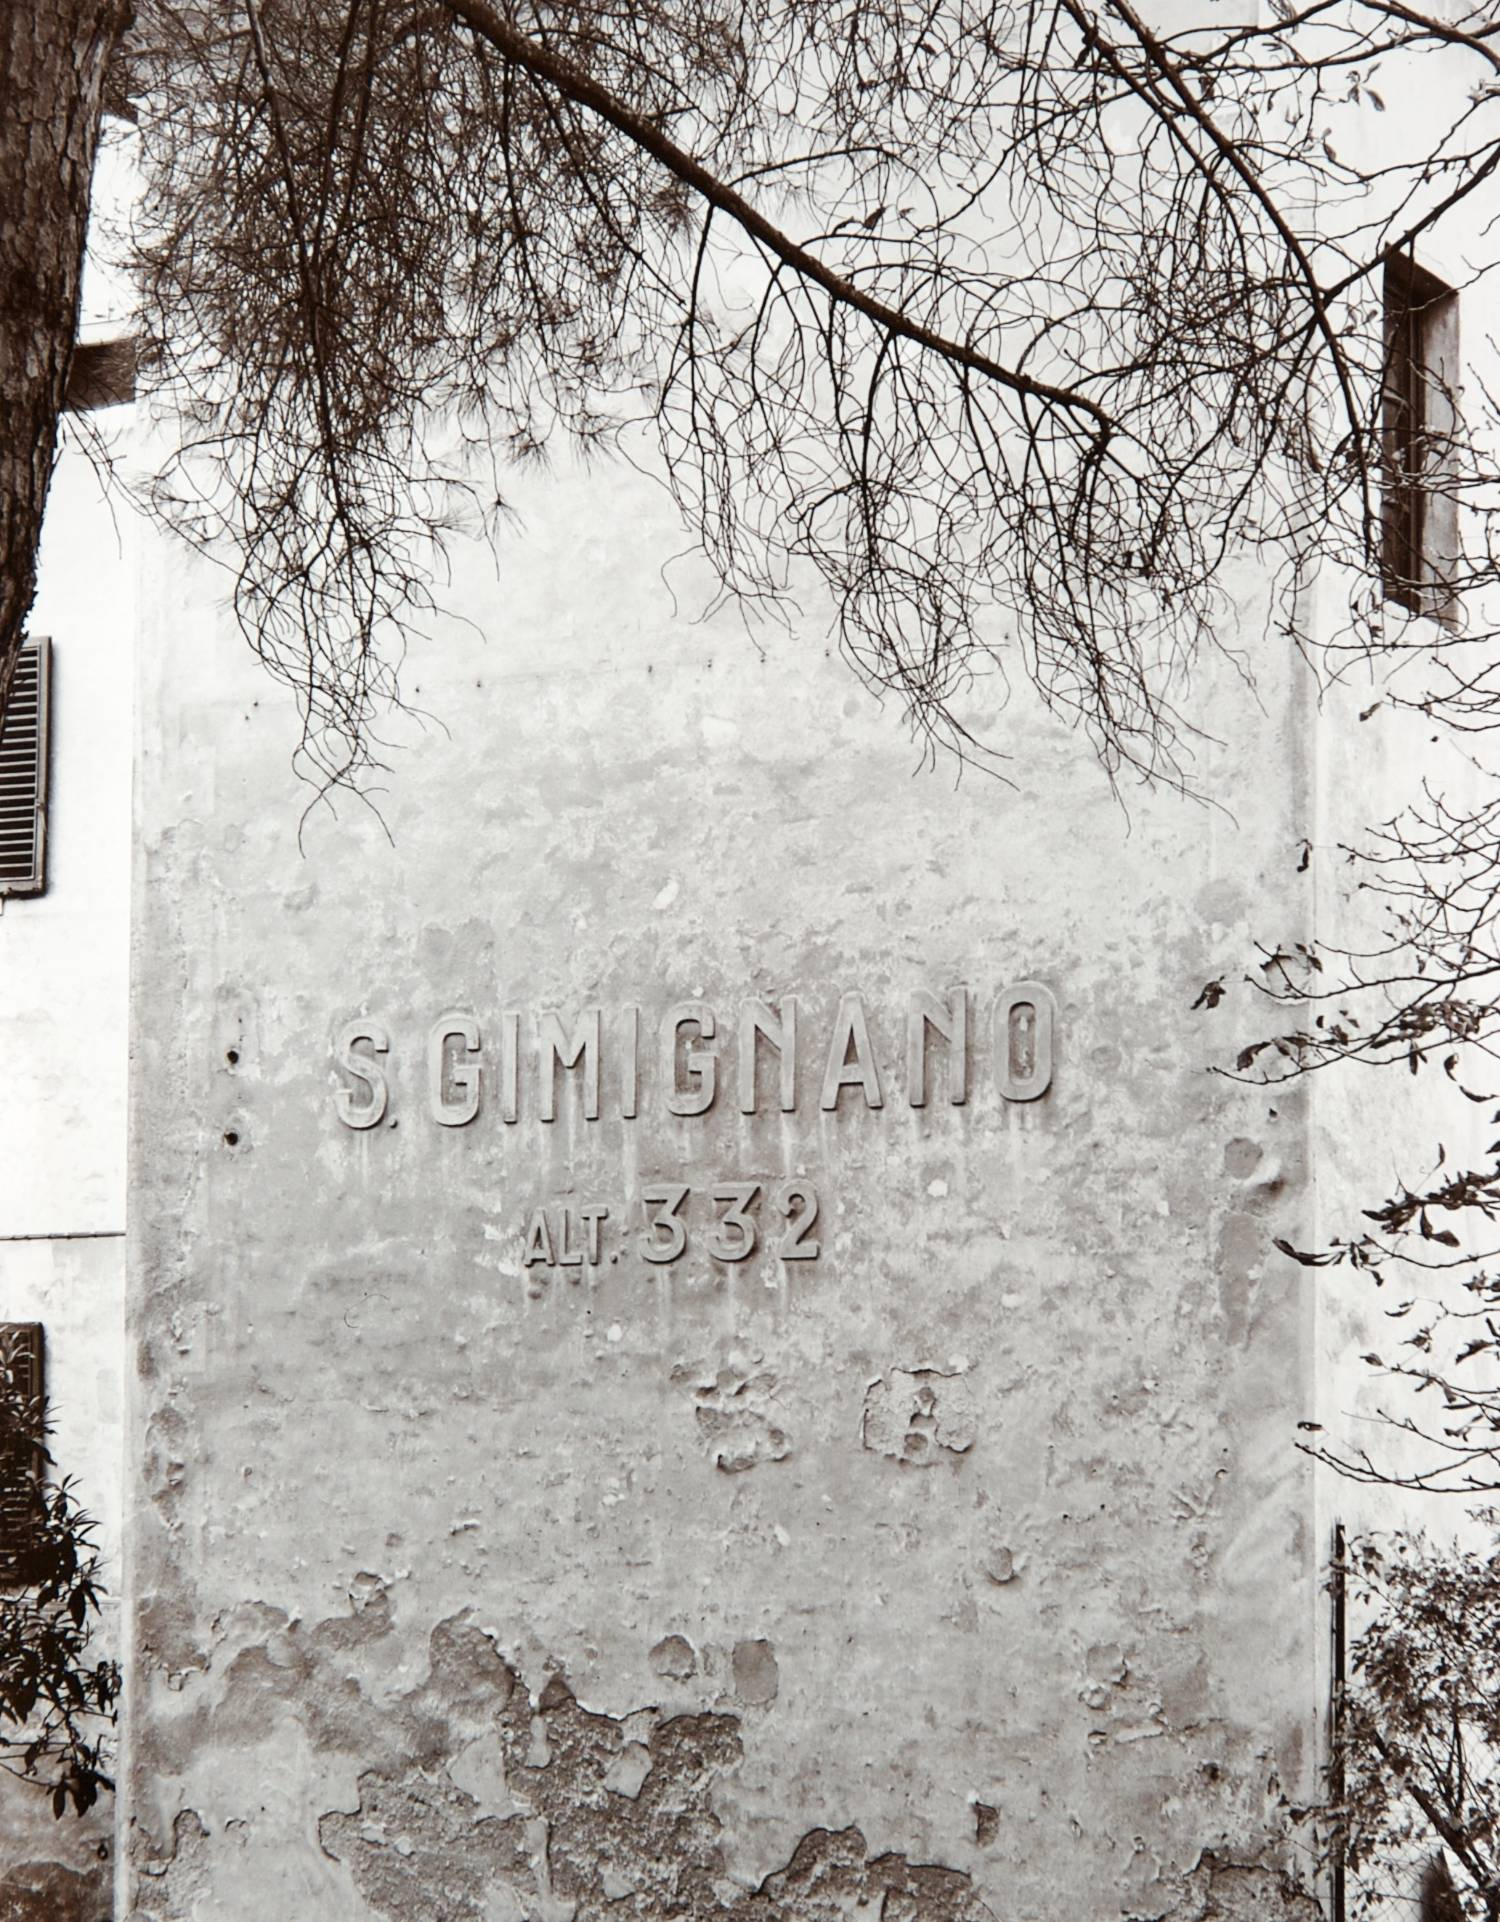 San Gimignano Sign (Italy)